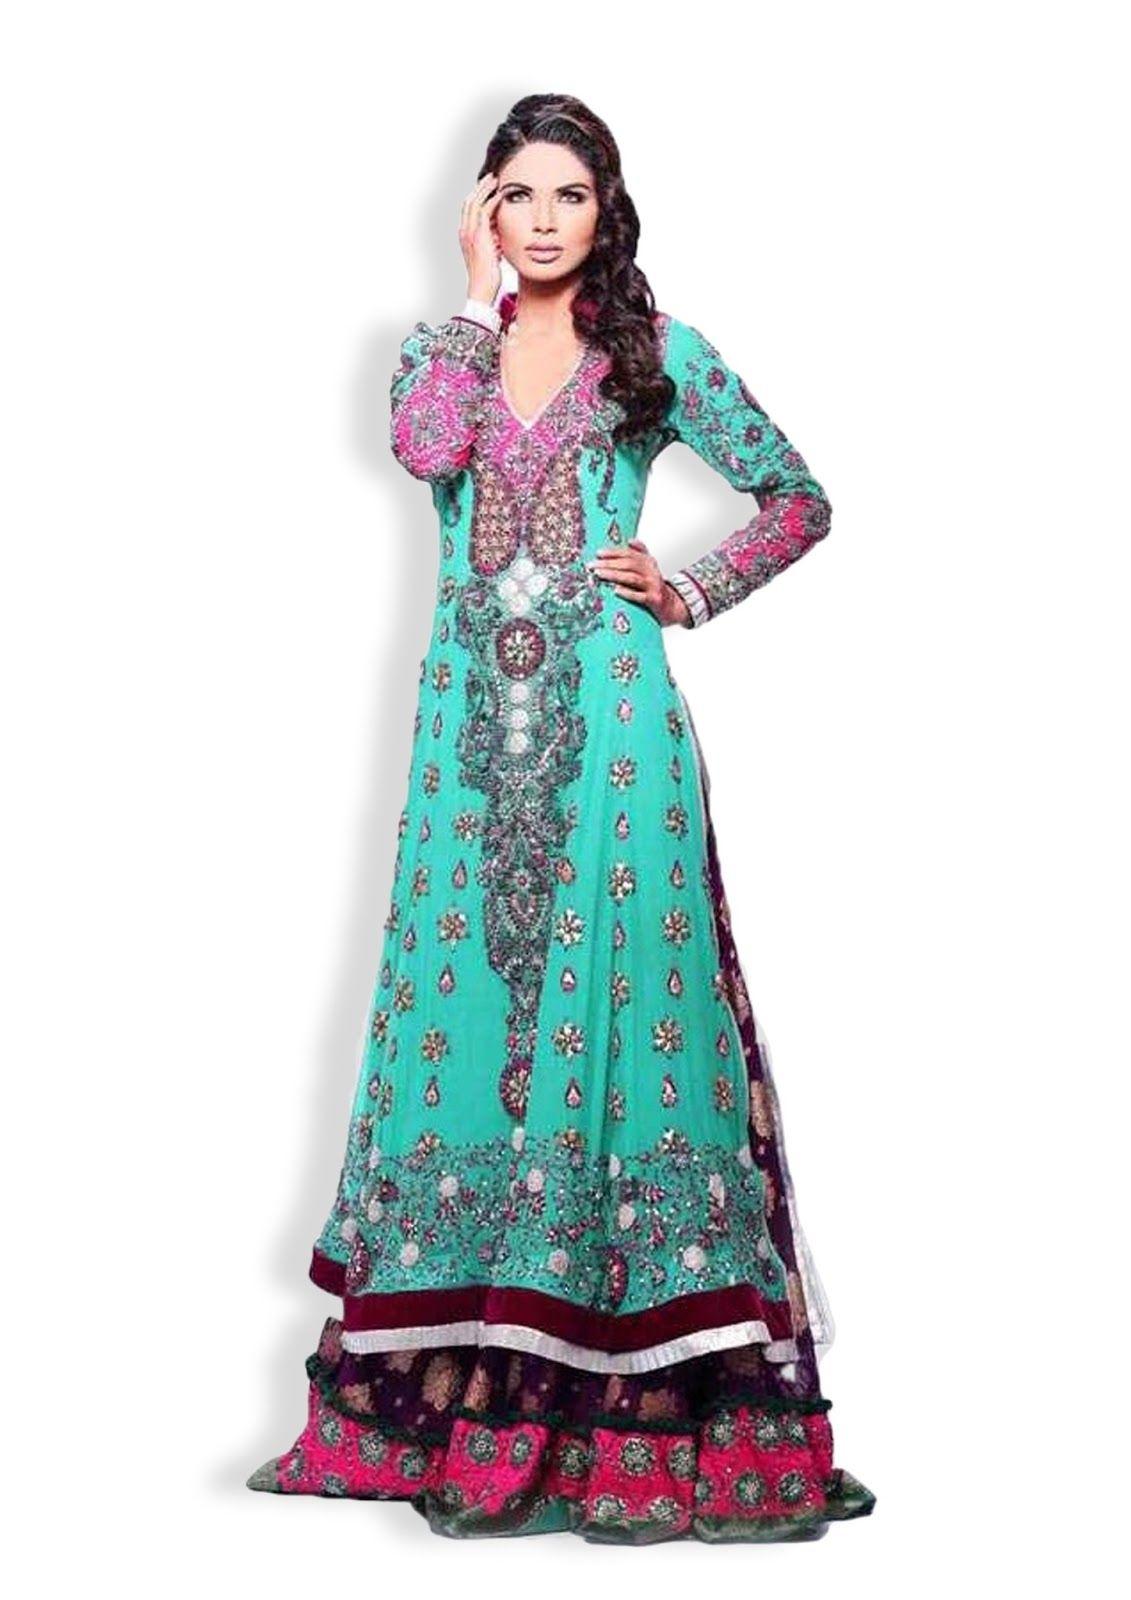 Fashion Ramp Pakistan Fashion Shows, Pakistani Fashion Weeks